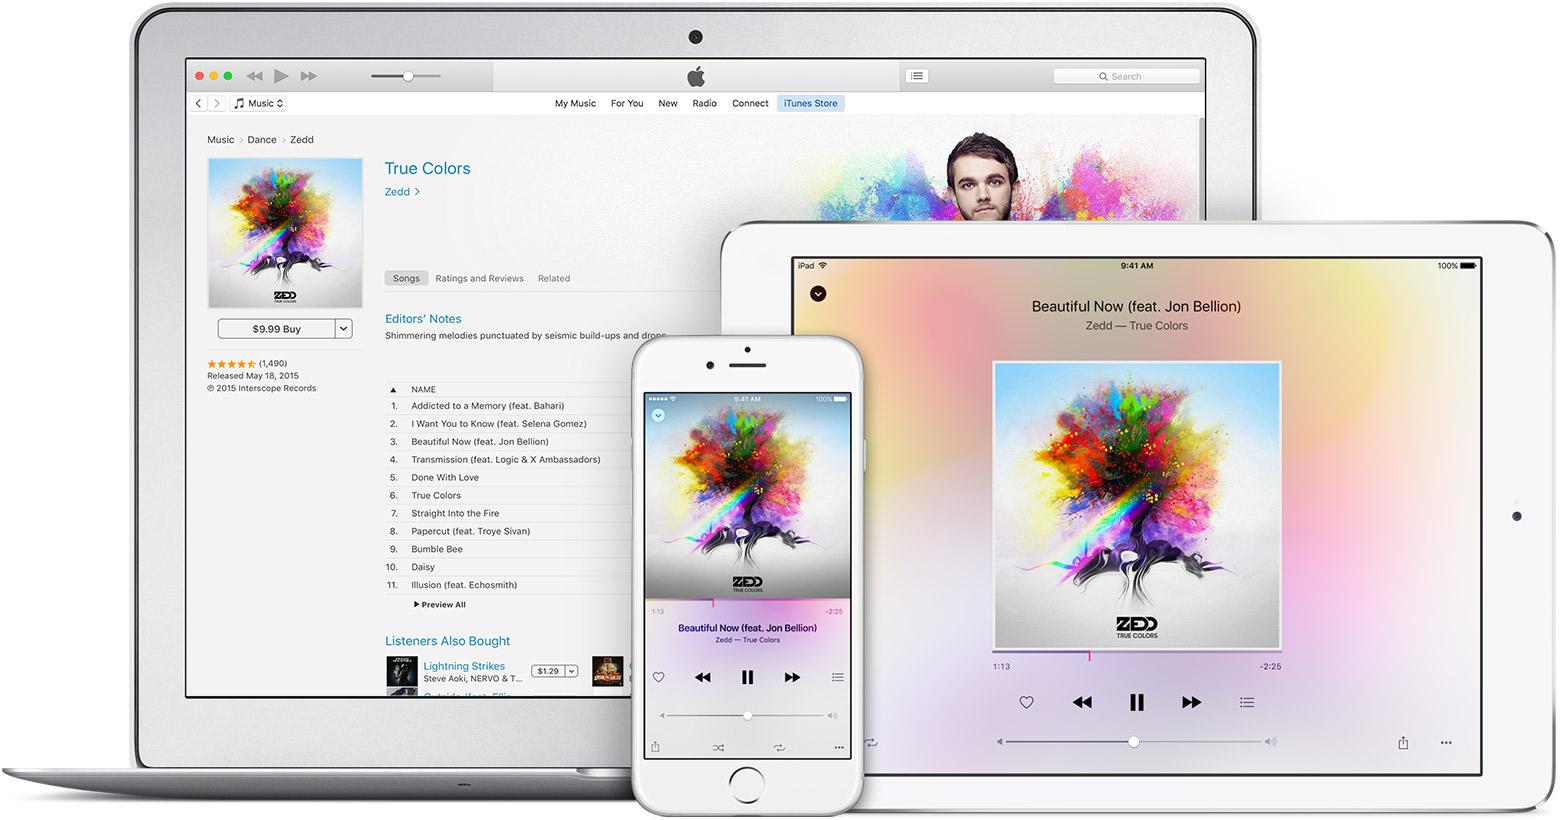 Get an Apple Music Student Membership